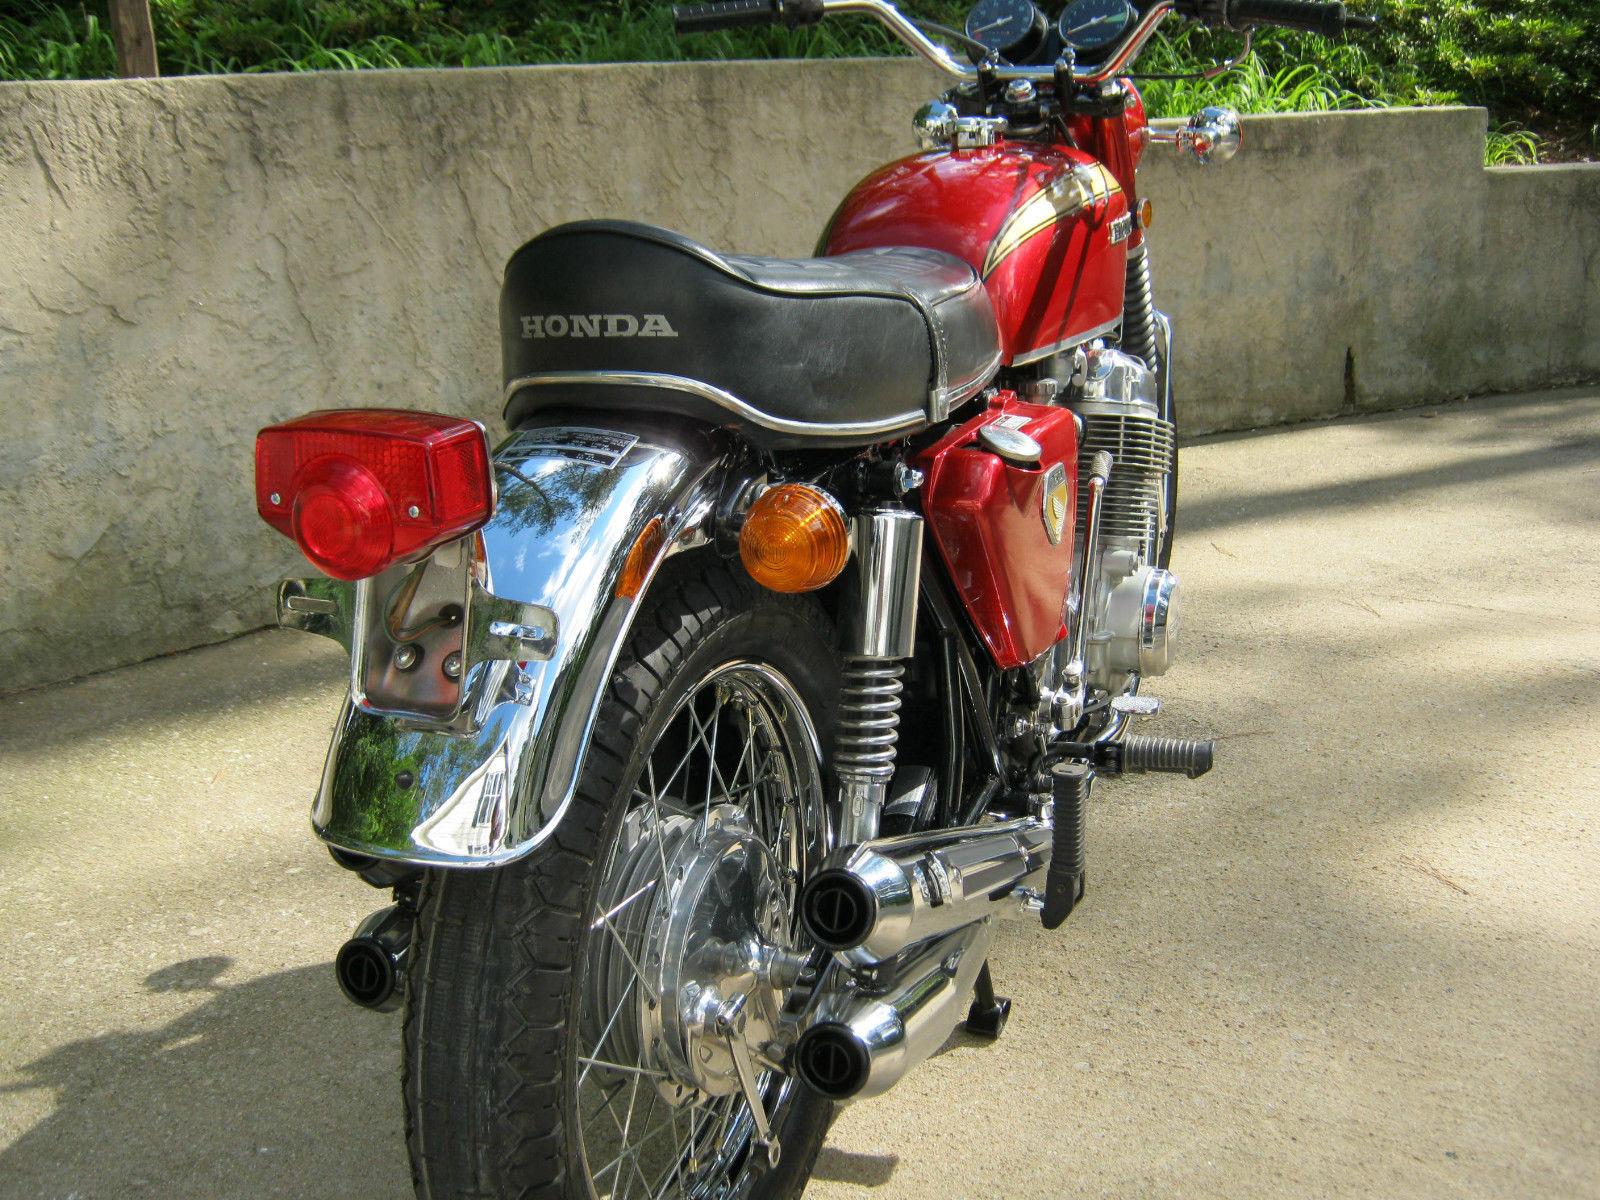 Honda CB750K0 -1969 - Rear Fender, Mufflers, Rear Light, Seat and Shocks.